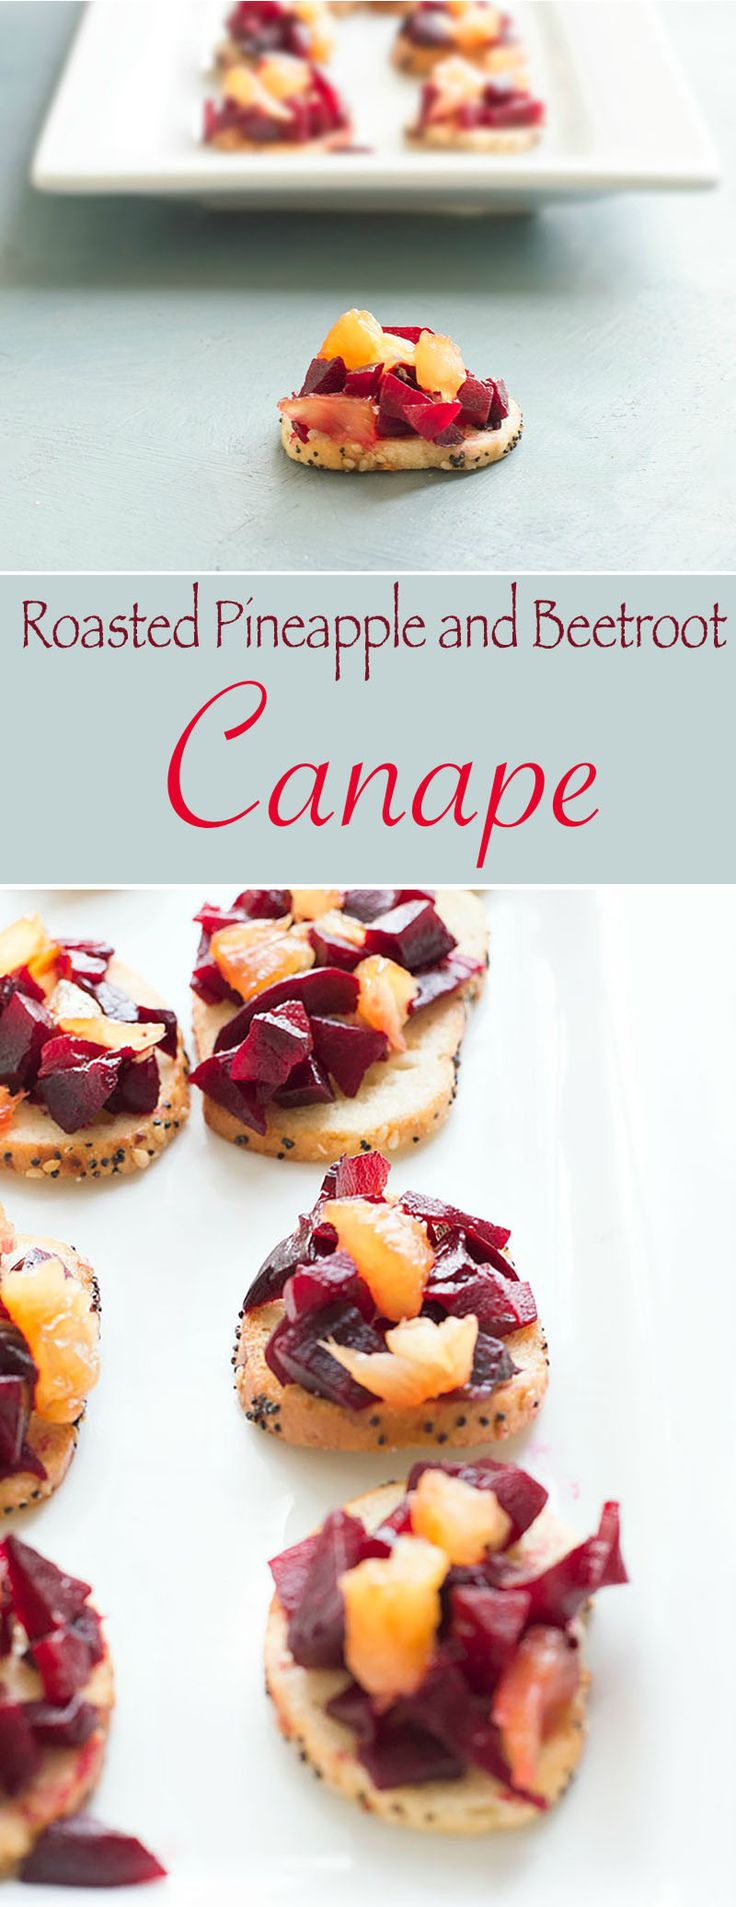 100 canapes recipes on pinterest canapes tapas ideas for Paula deen mushroom canape